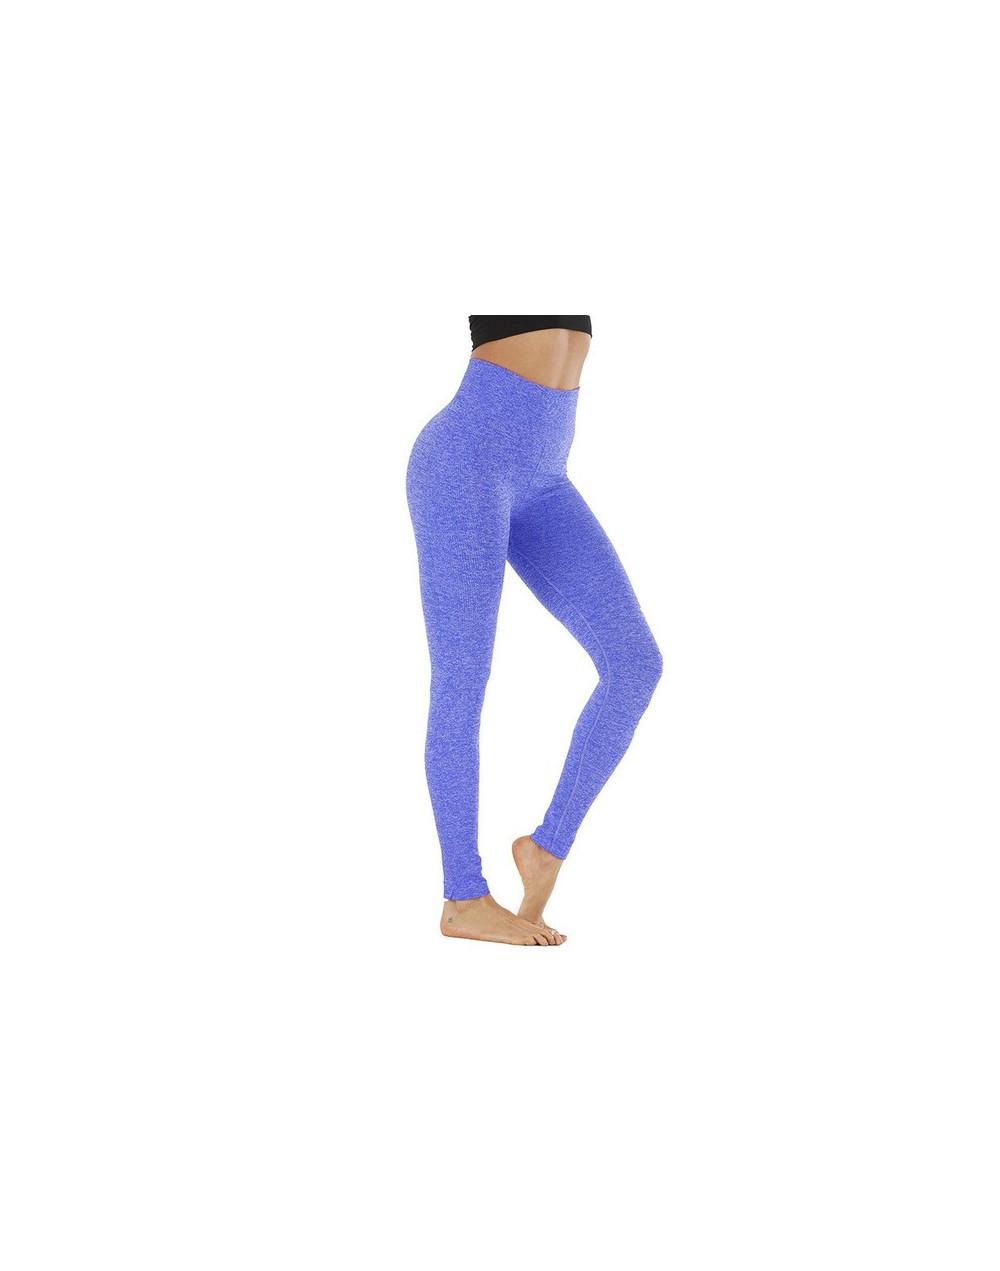 New Women High Elastic Fitness Leggings Athleisure Pants Slim Running Sportswear Sporting Pants Trousers Clothing Sexy Leggi...